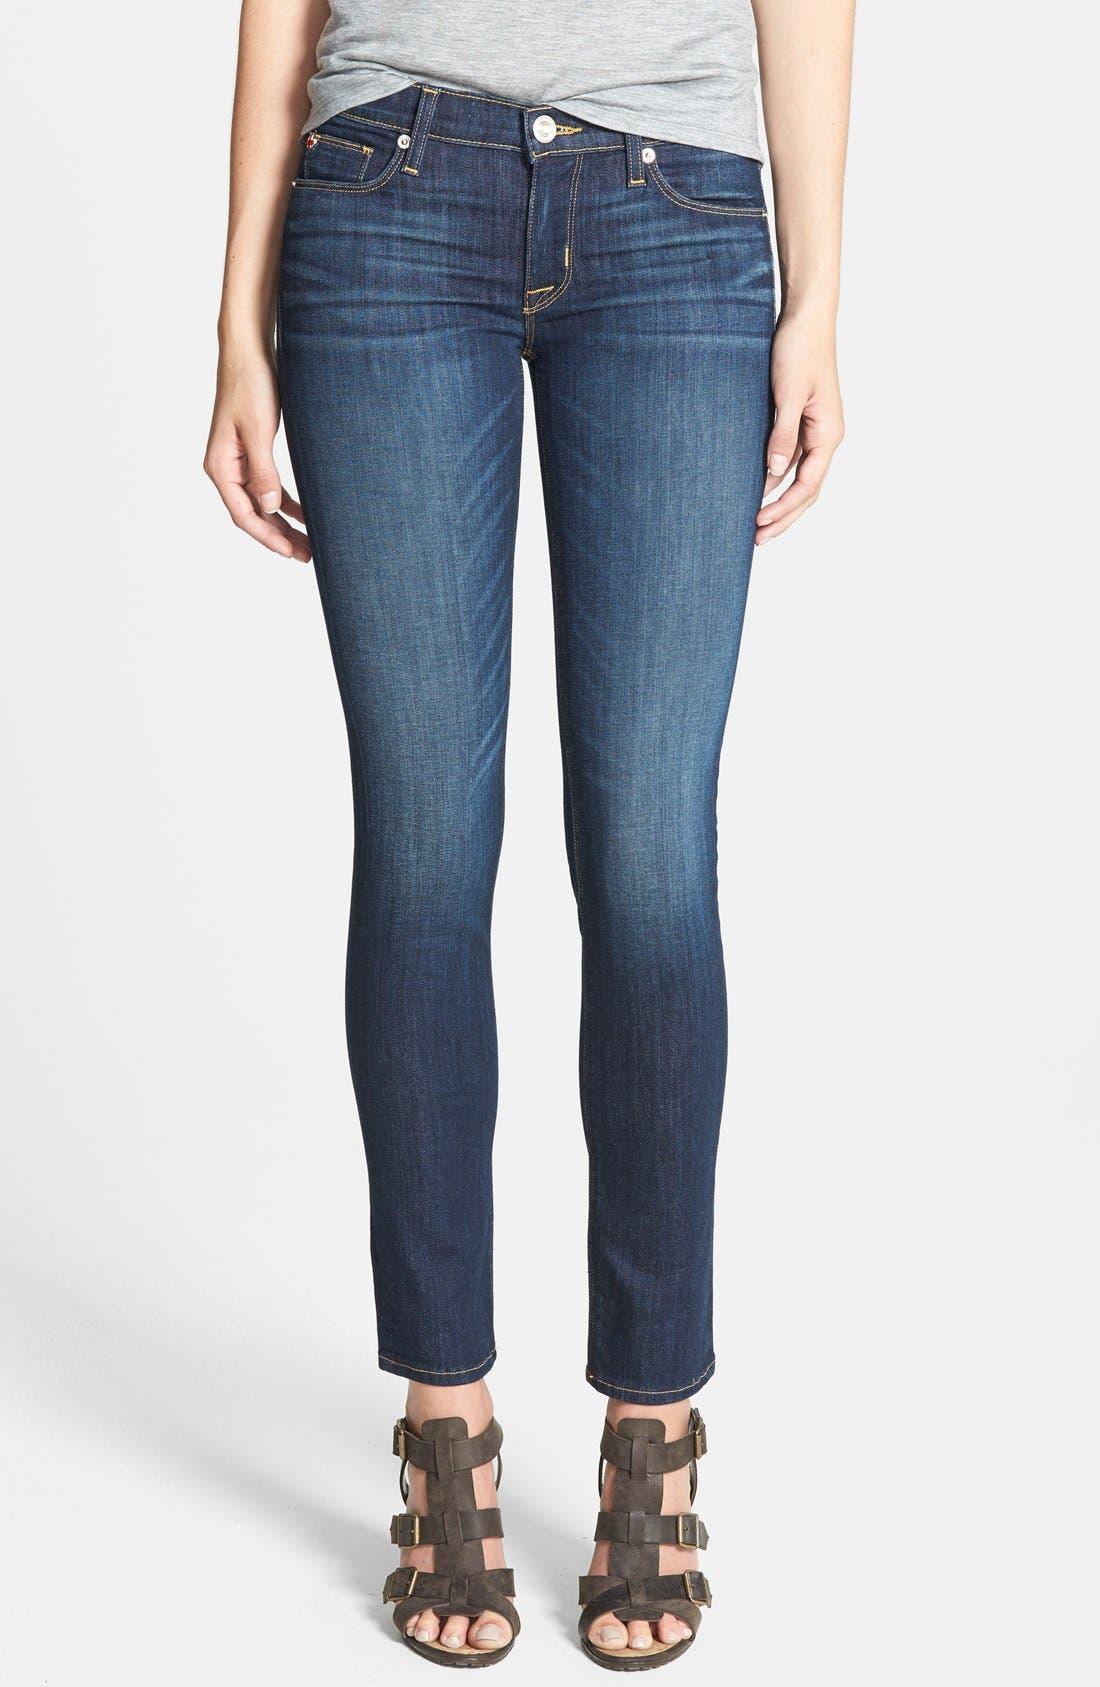 Main Image - Hudson Jeans 'Collette' Skinny Jeans (Stella)